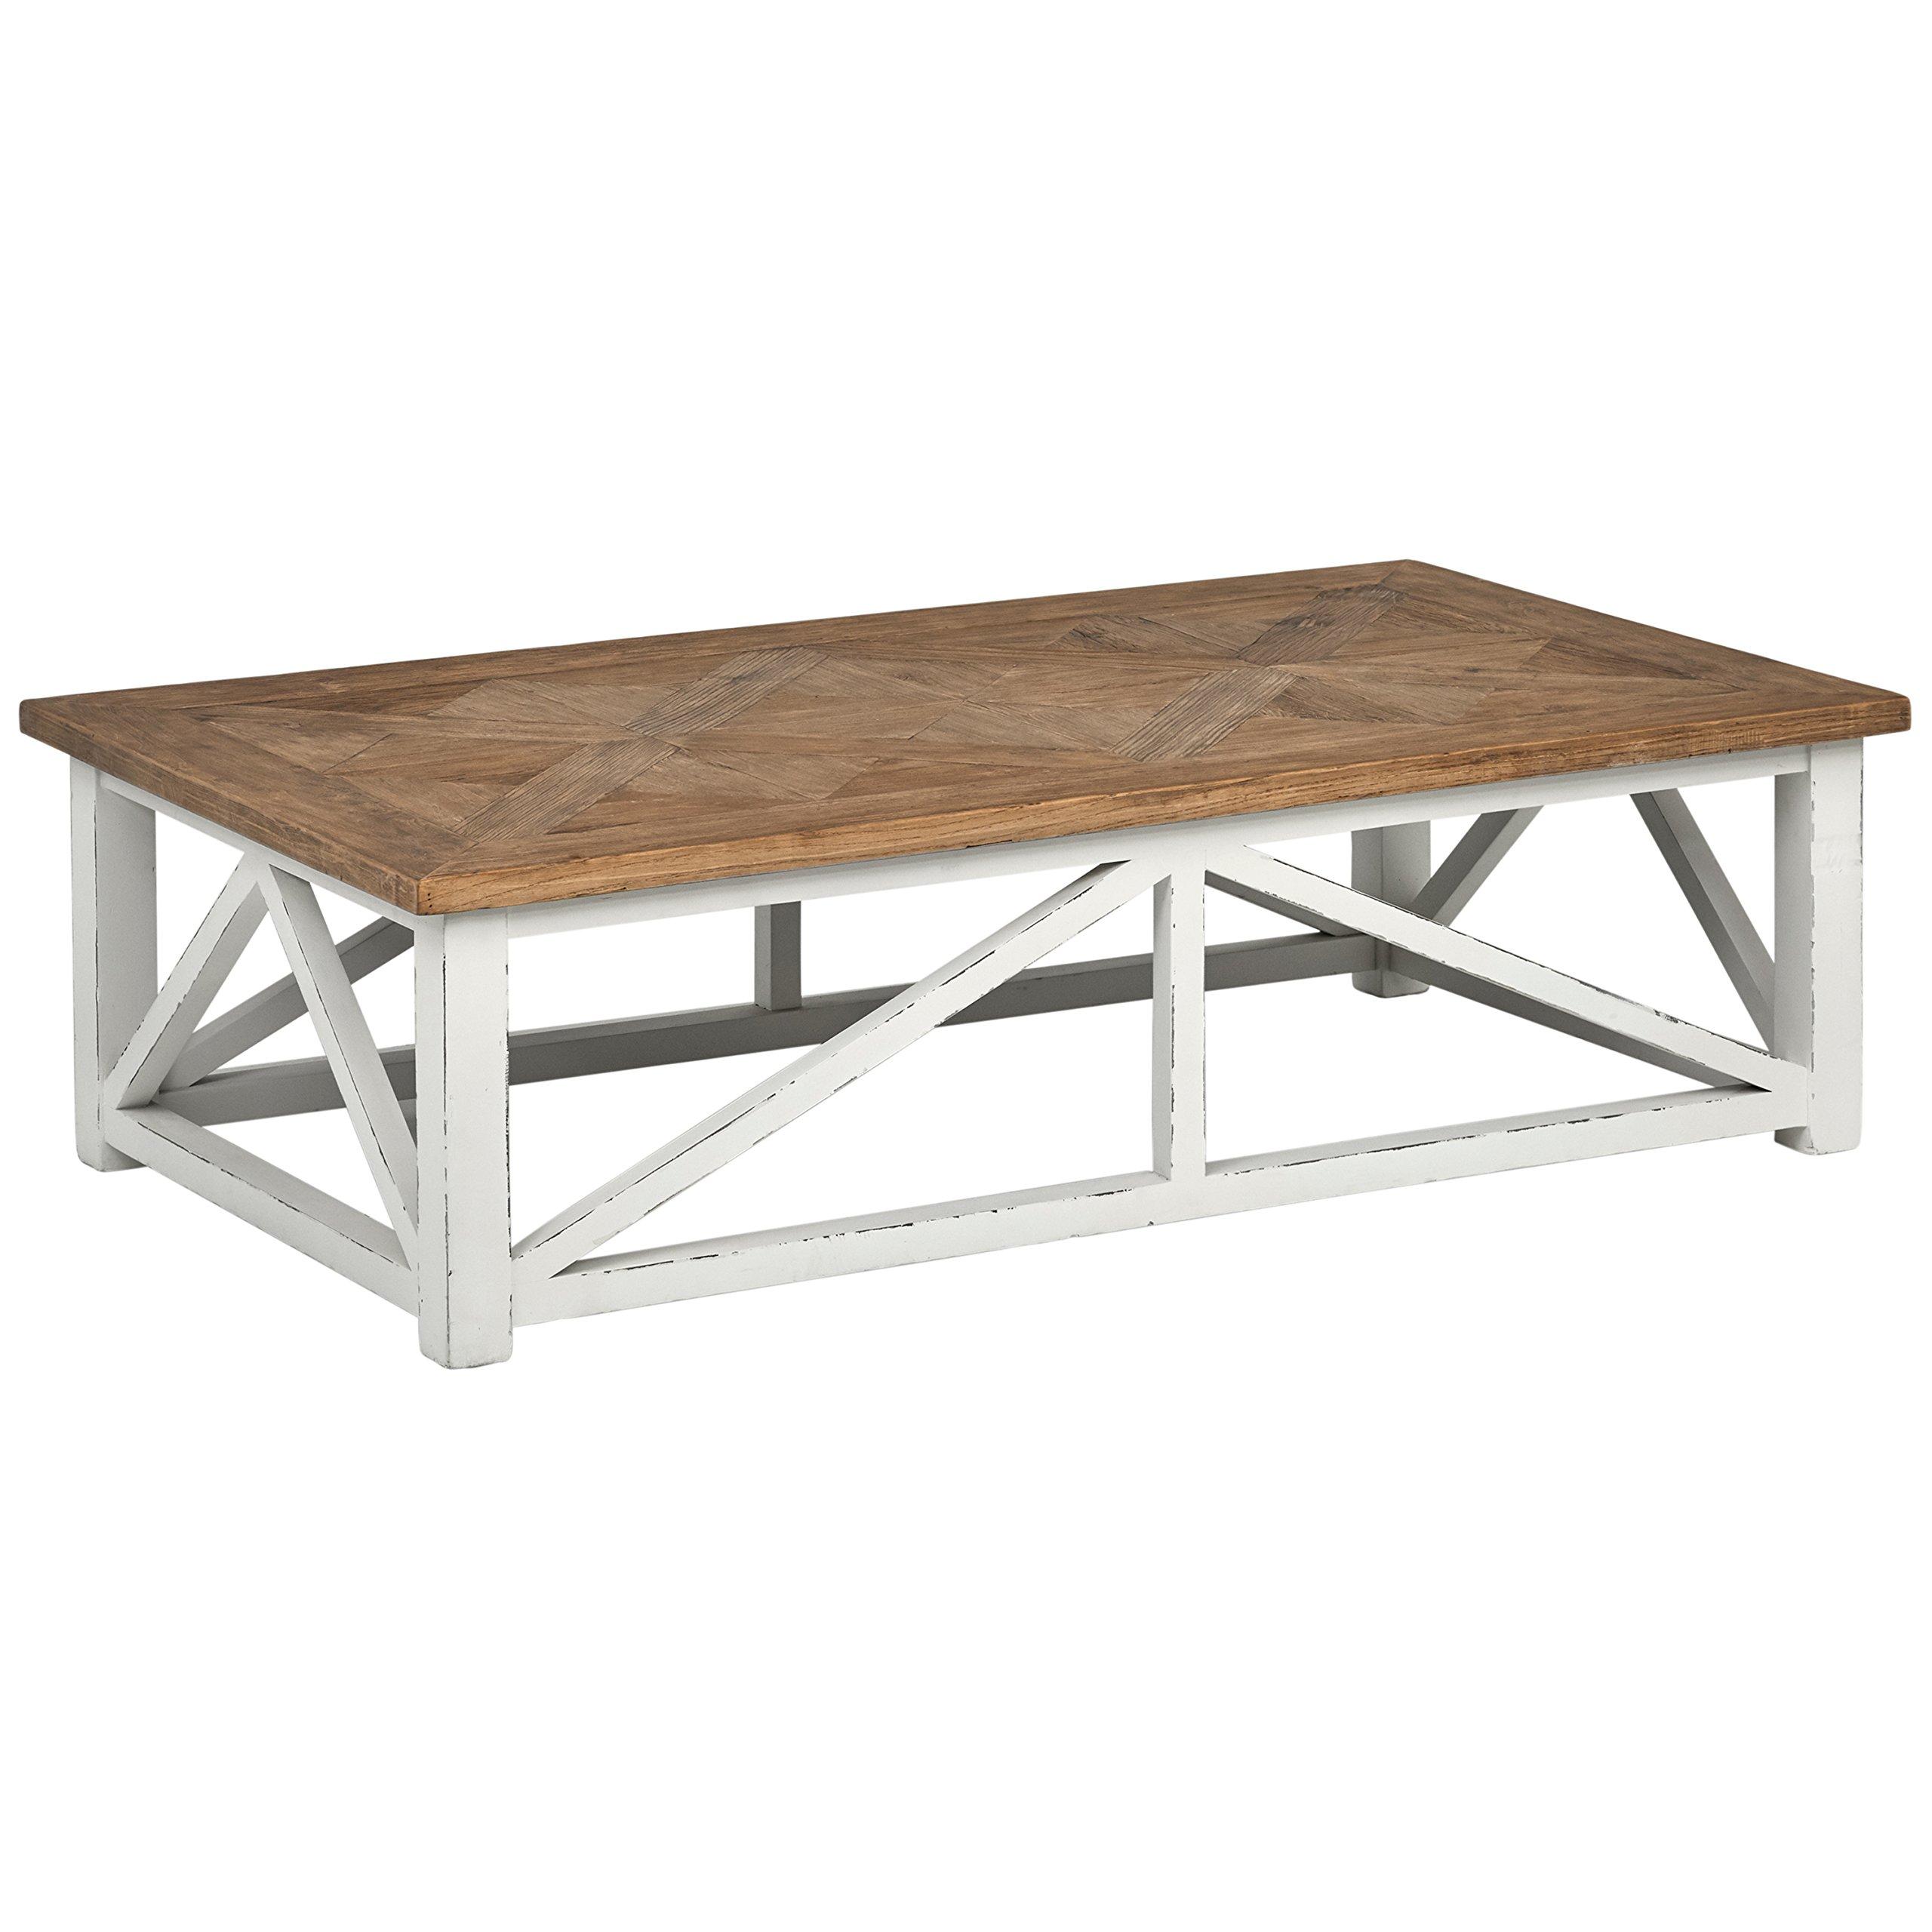 Stone Beam Coastal Breeze Rustic Farmhouse Coffee Table 55 1 W